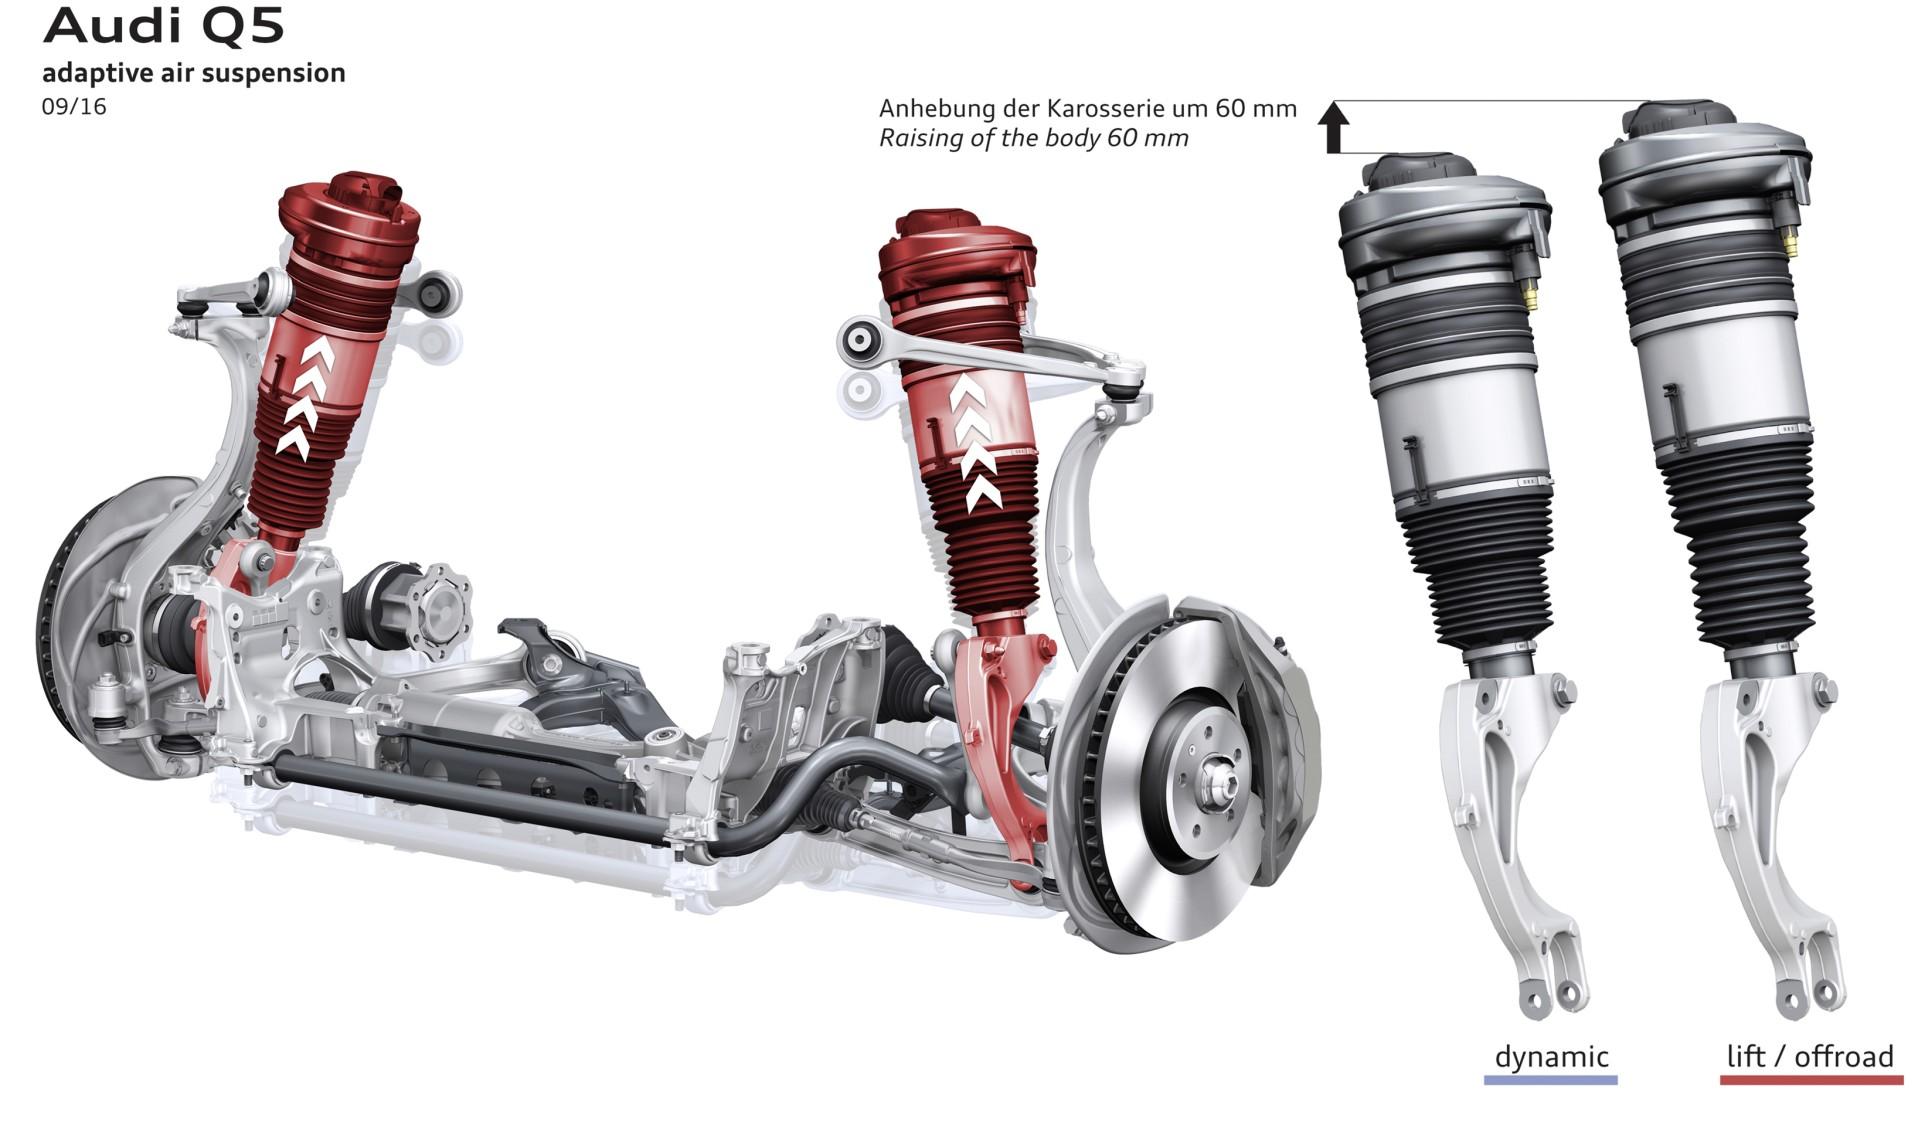 Audi Q5 Luftfederung - Bild: AUDI AG